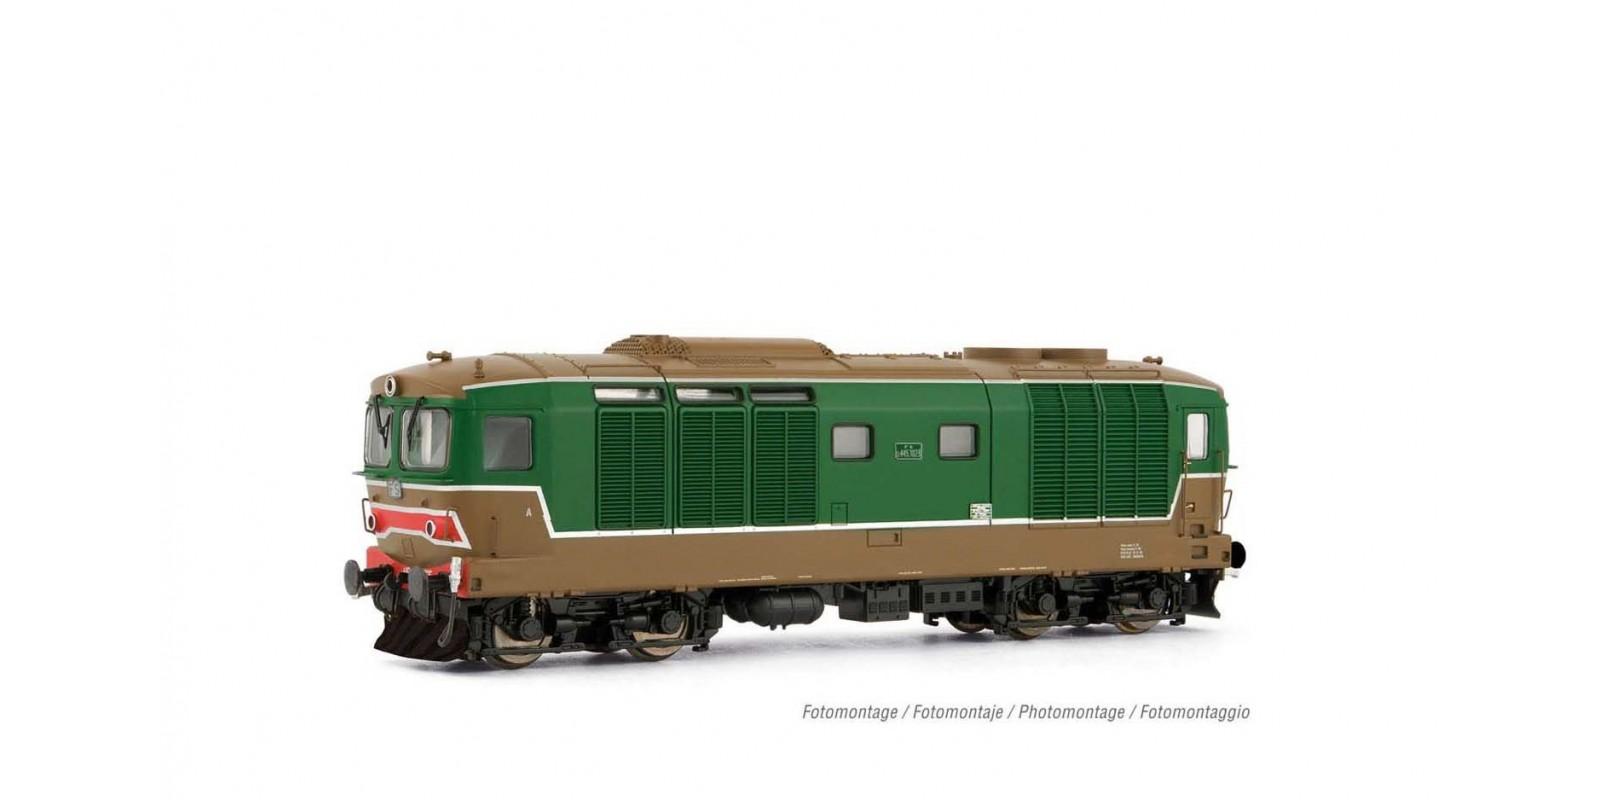 LI2650 FS, D445 1st series, green/brown livery, ep. IV-V